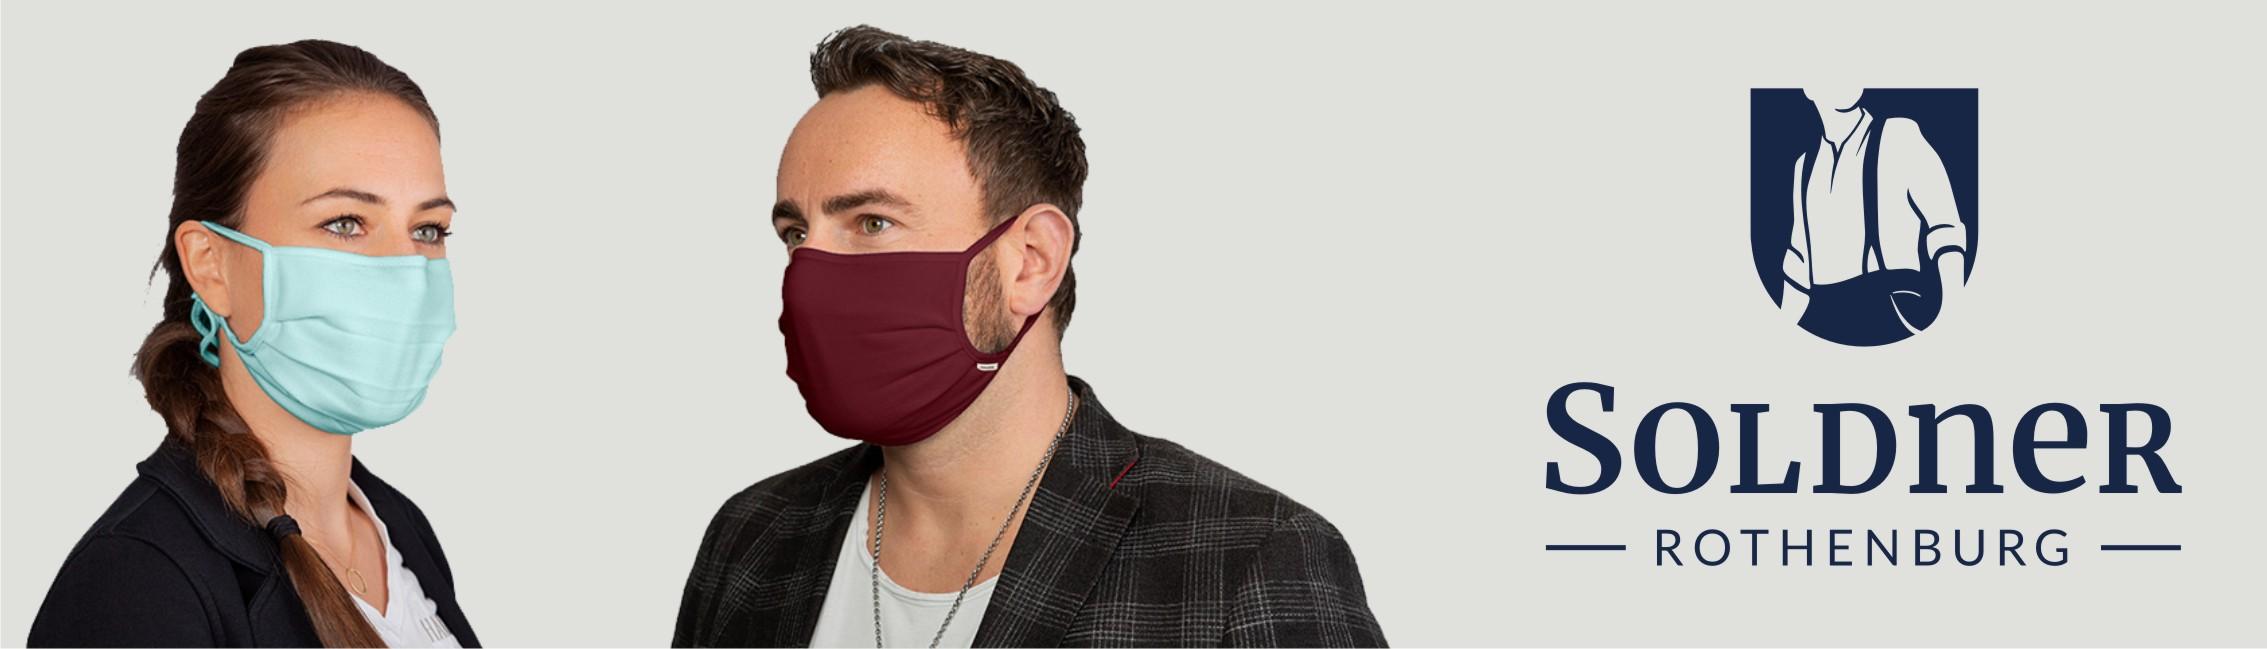 HAKRO Mund-Nasen-Maske #2603